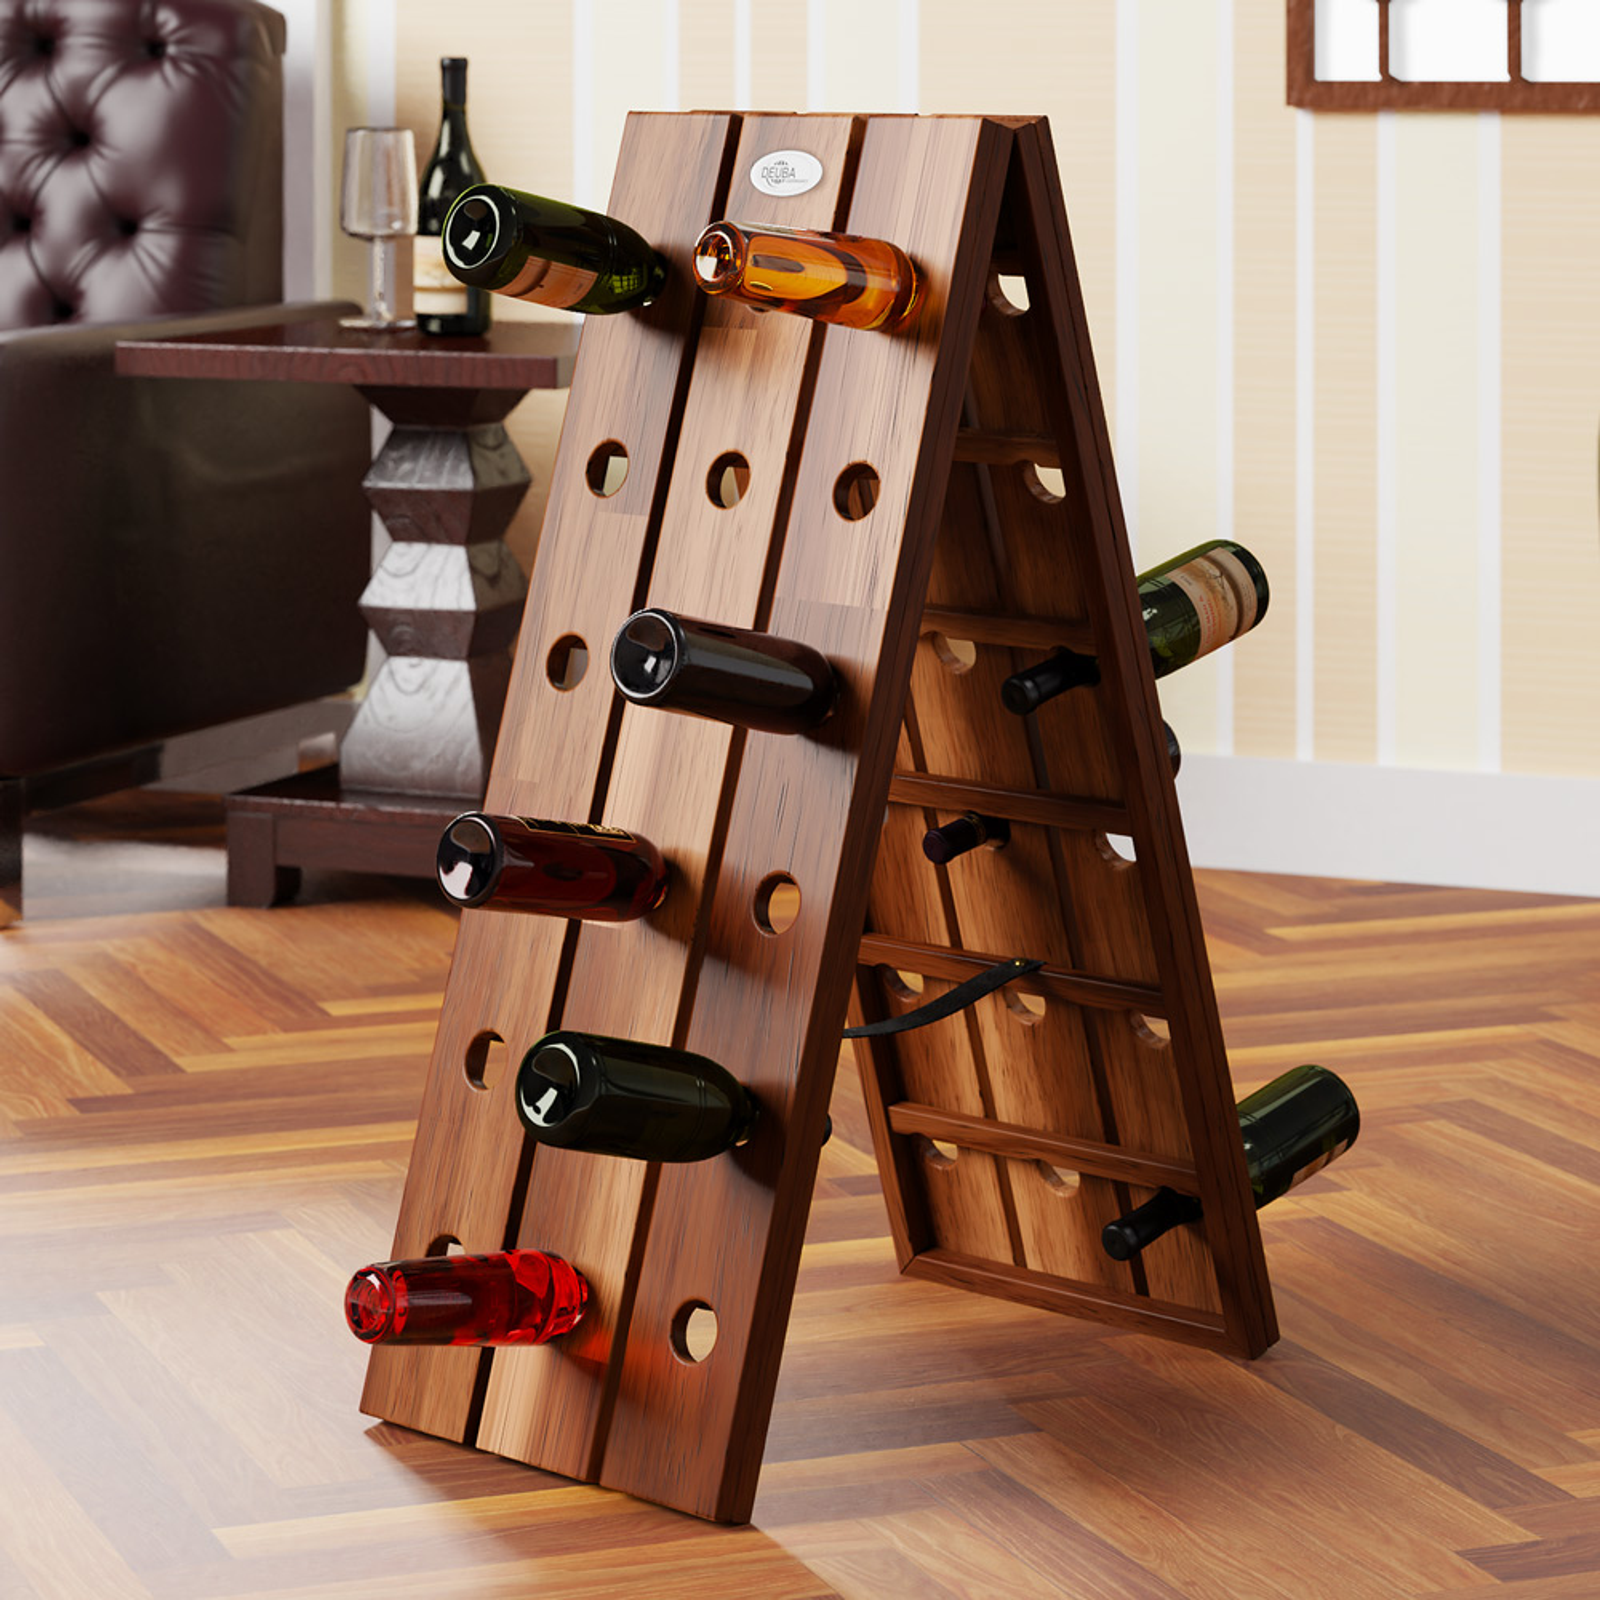 b ware weinregal aus holz f r 36 flaschen flaschenregal. Black Bedroom Furniture Sets. Home Design Ideas